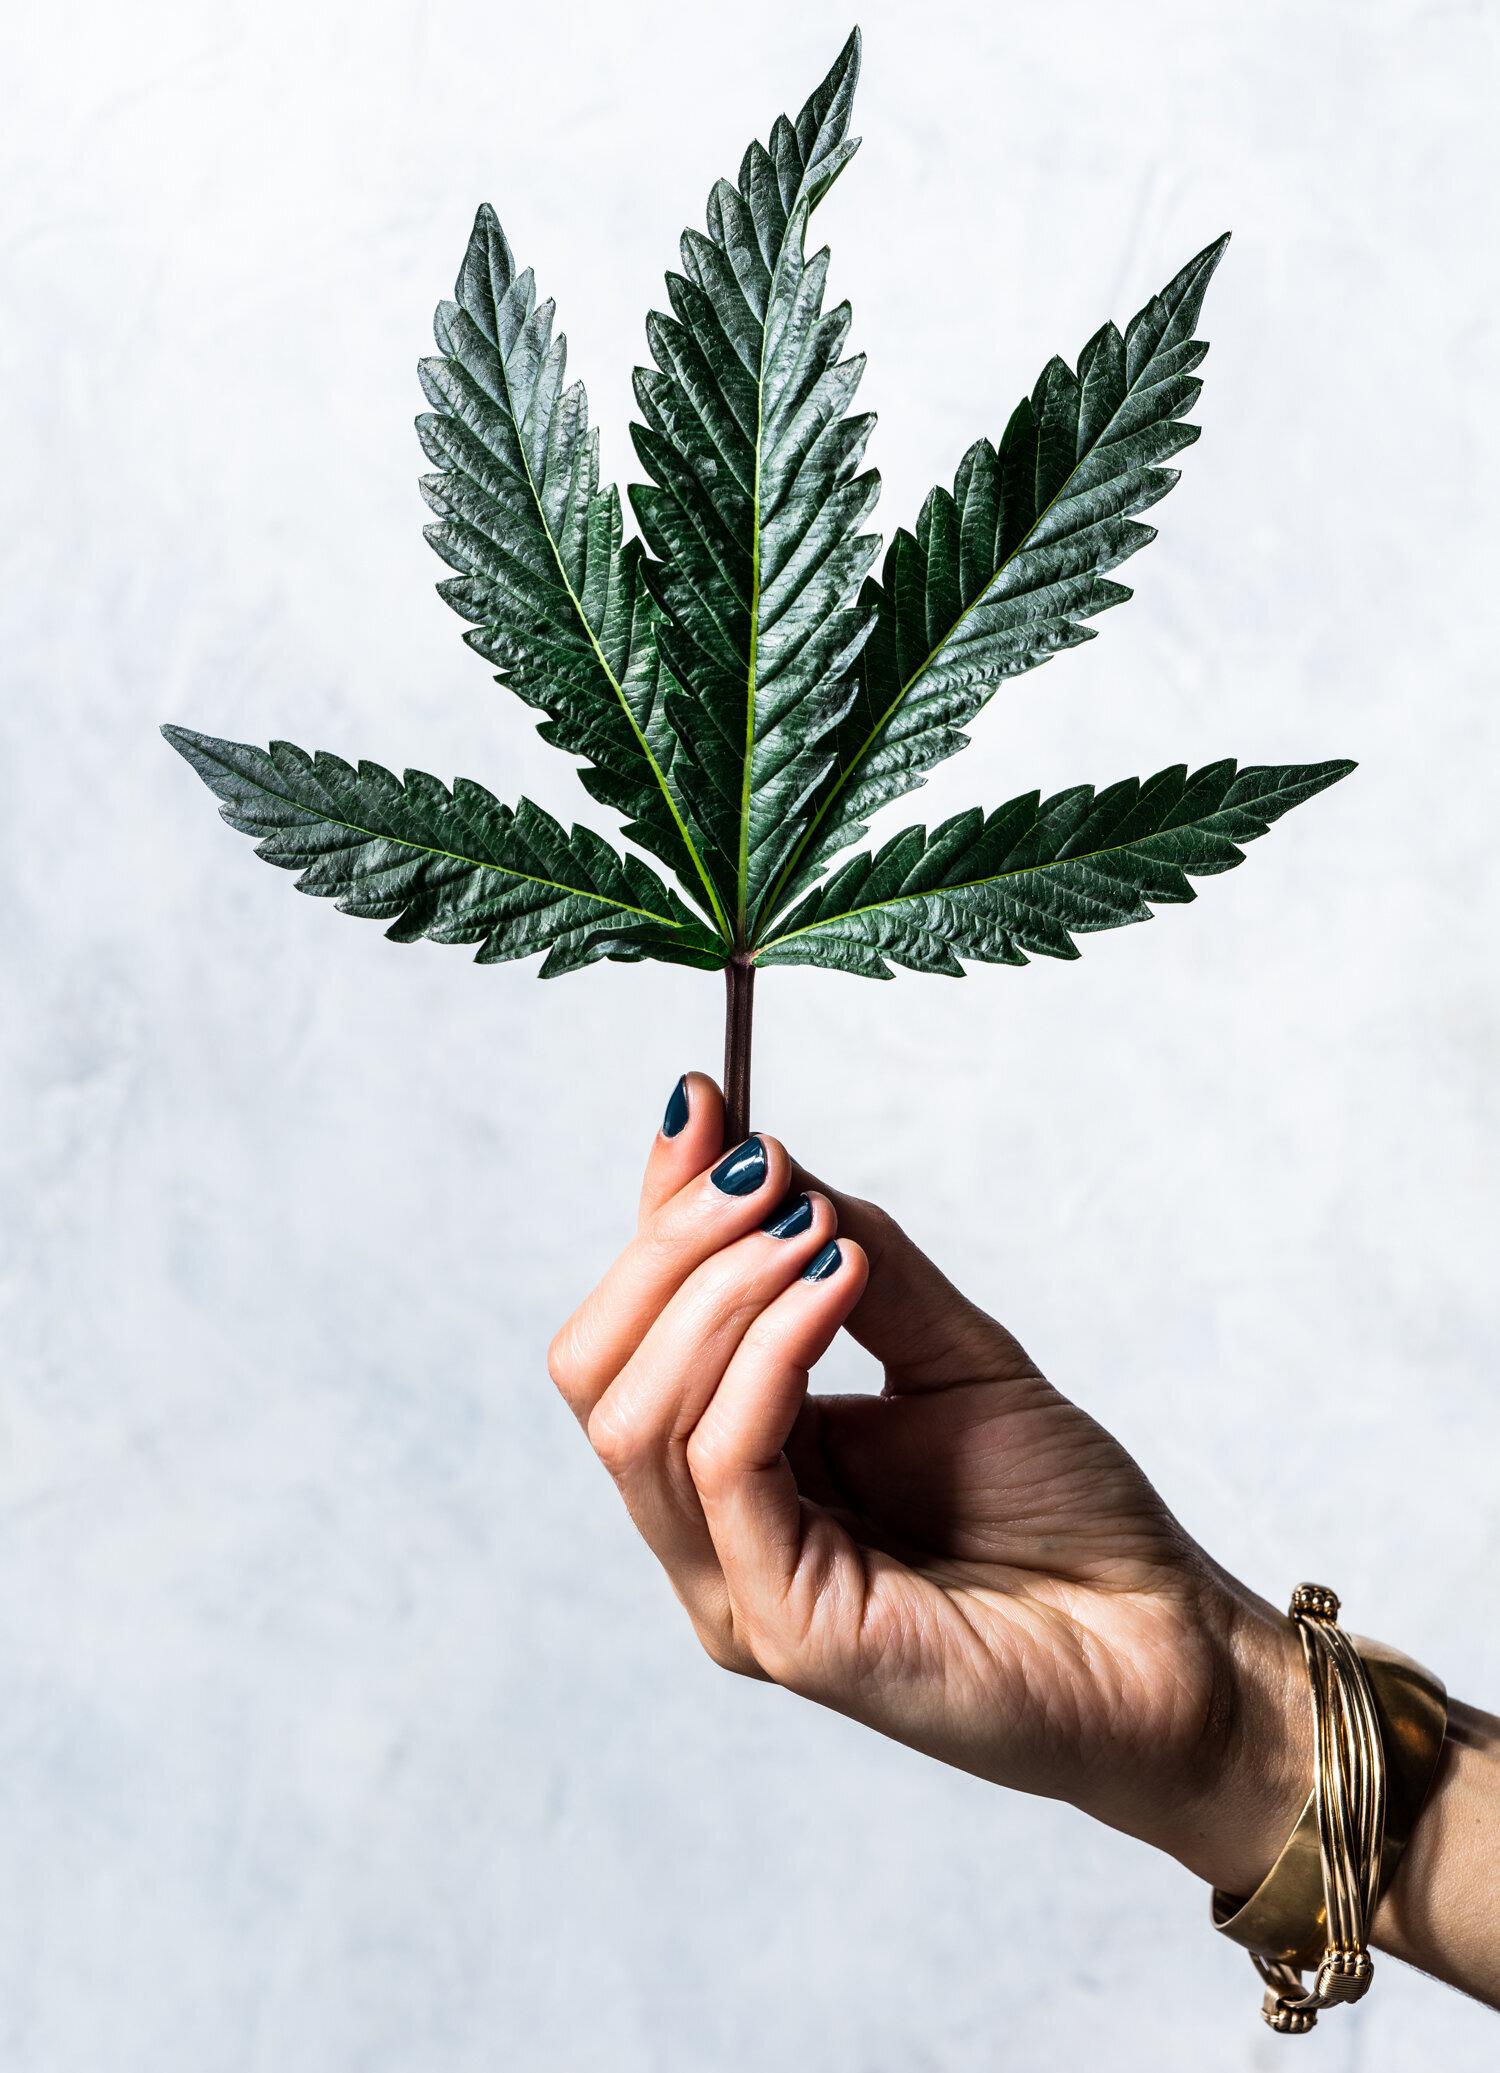 erin-scott-san-francisco-california-cannabis-photographer-ten-speed-press-editorial-9026.jpg